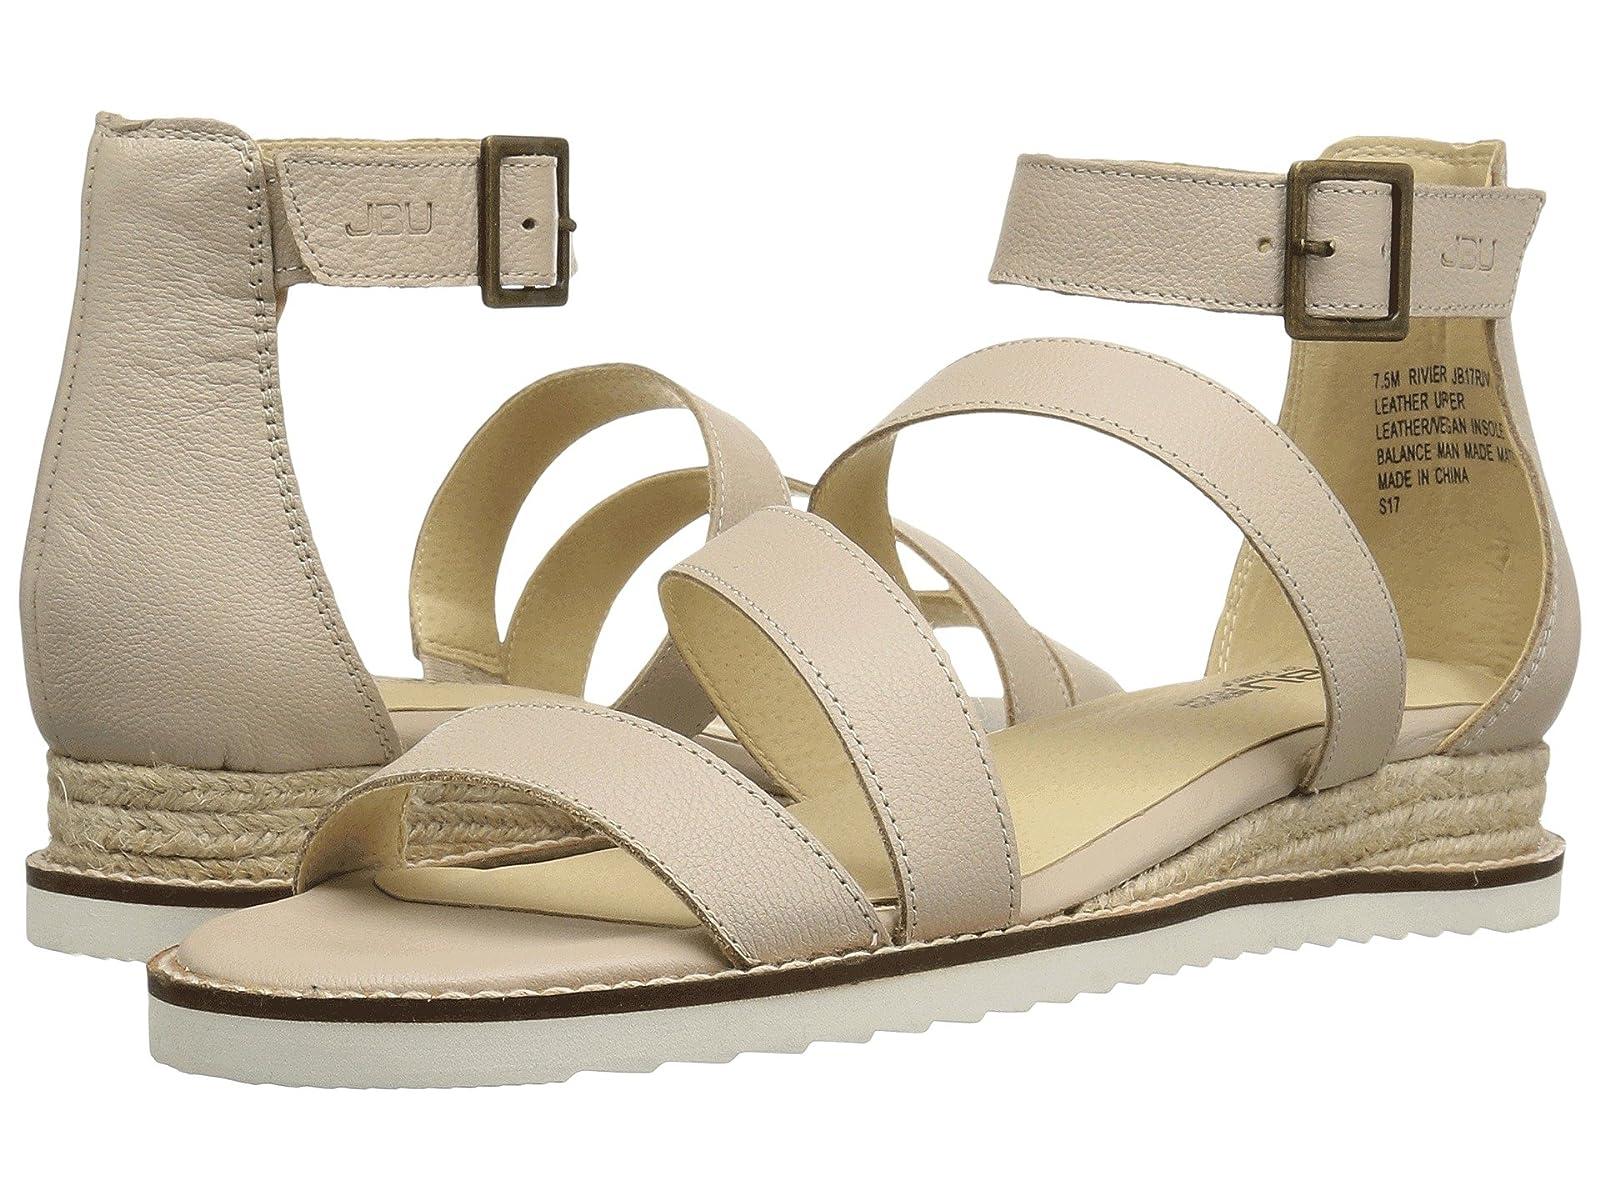 JBU RivieraCheap and distinctive eye-catching shoes